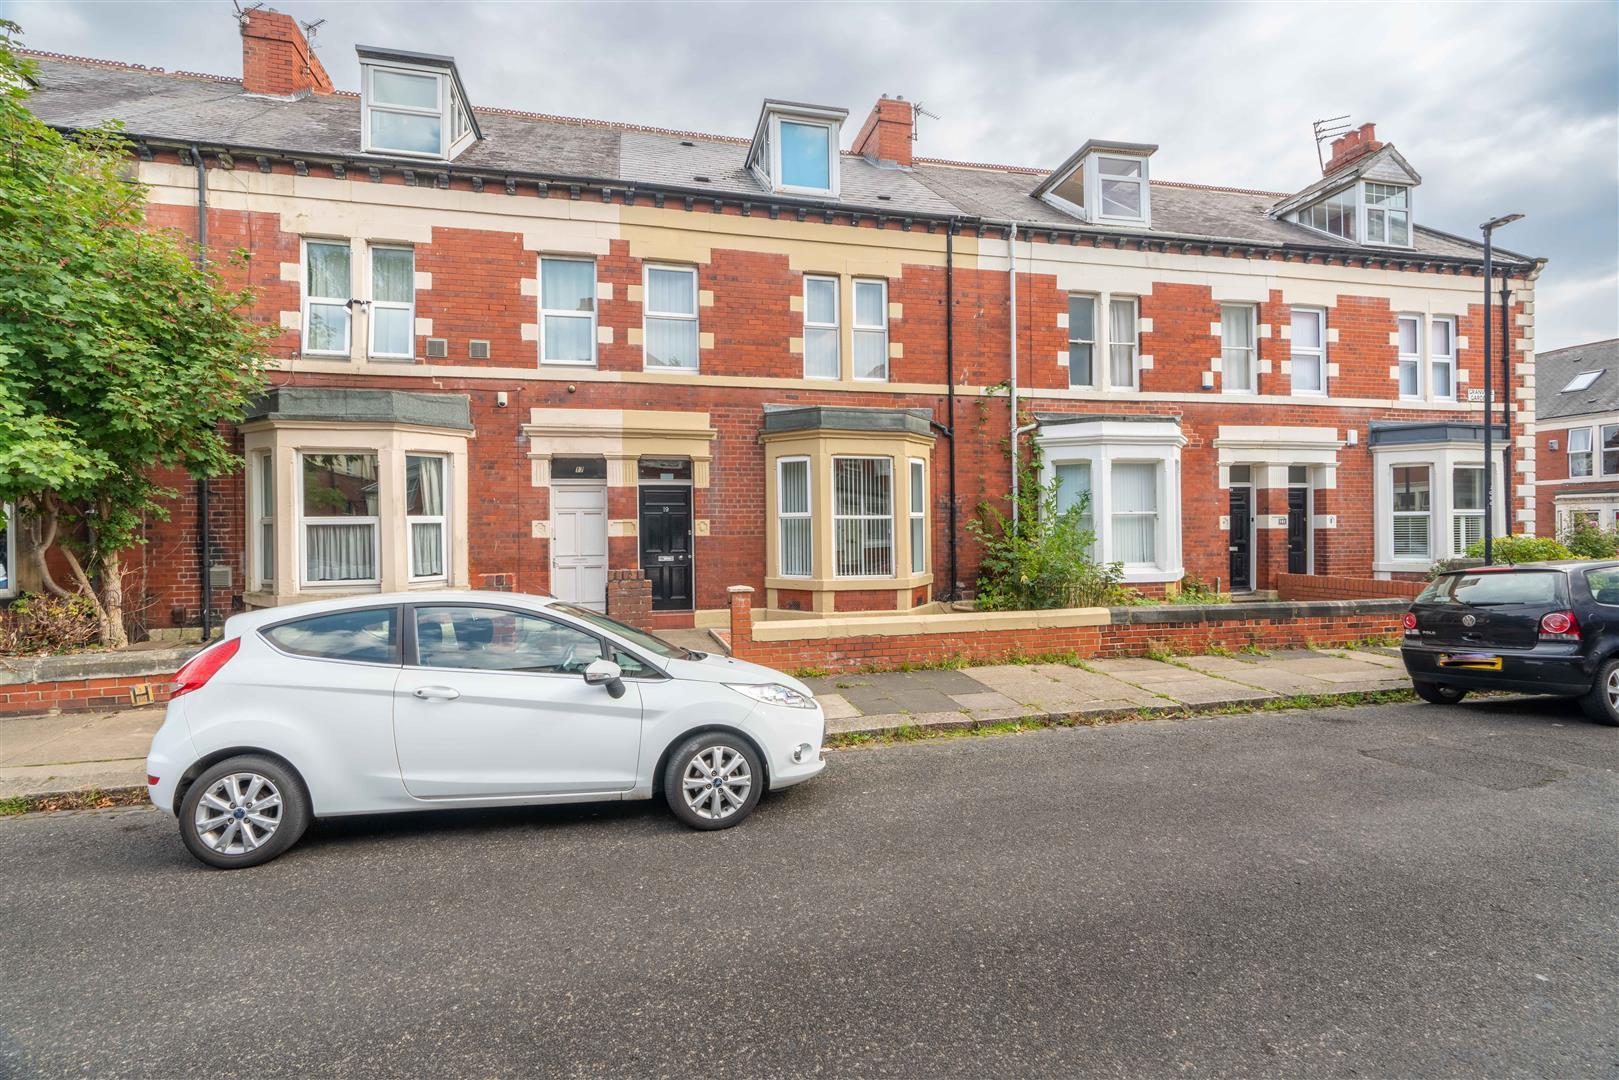 6 bed terraced house for sale in Granville Gardens, Jesmond Vale, NE2